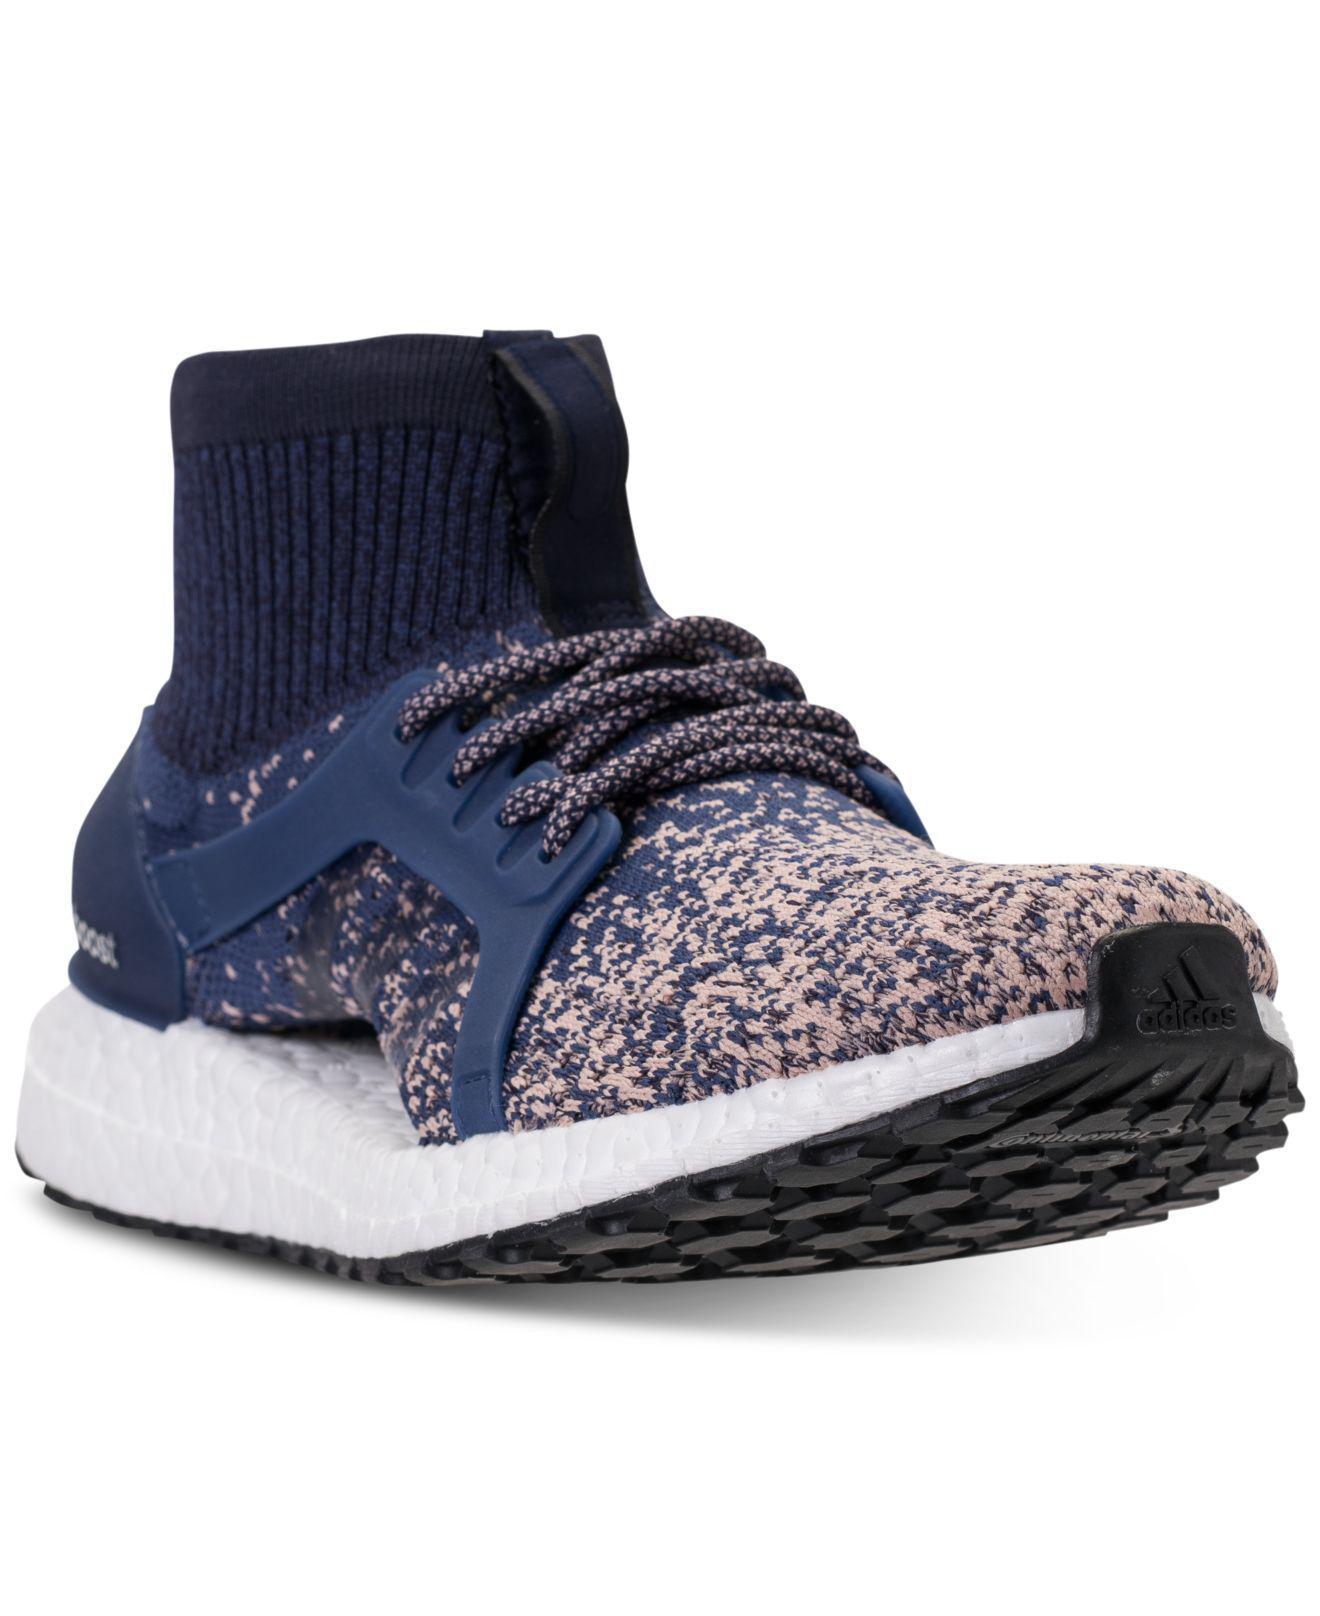 Lyst Adidas Ultraboost X Atr In Scarpe Dal Traguardo In Blu